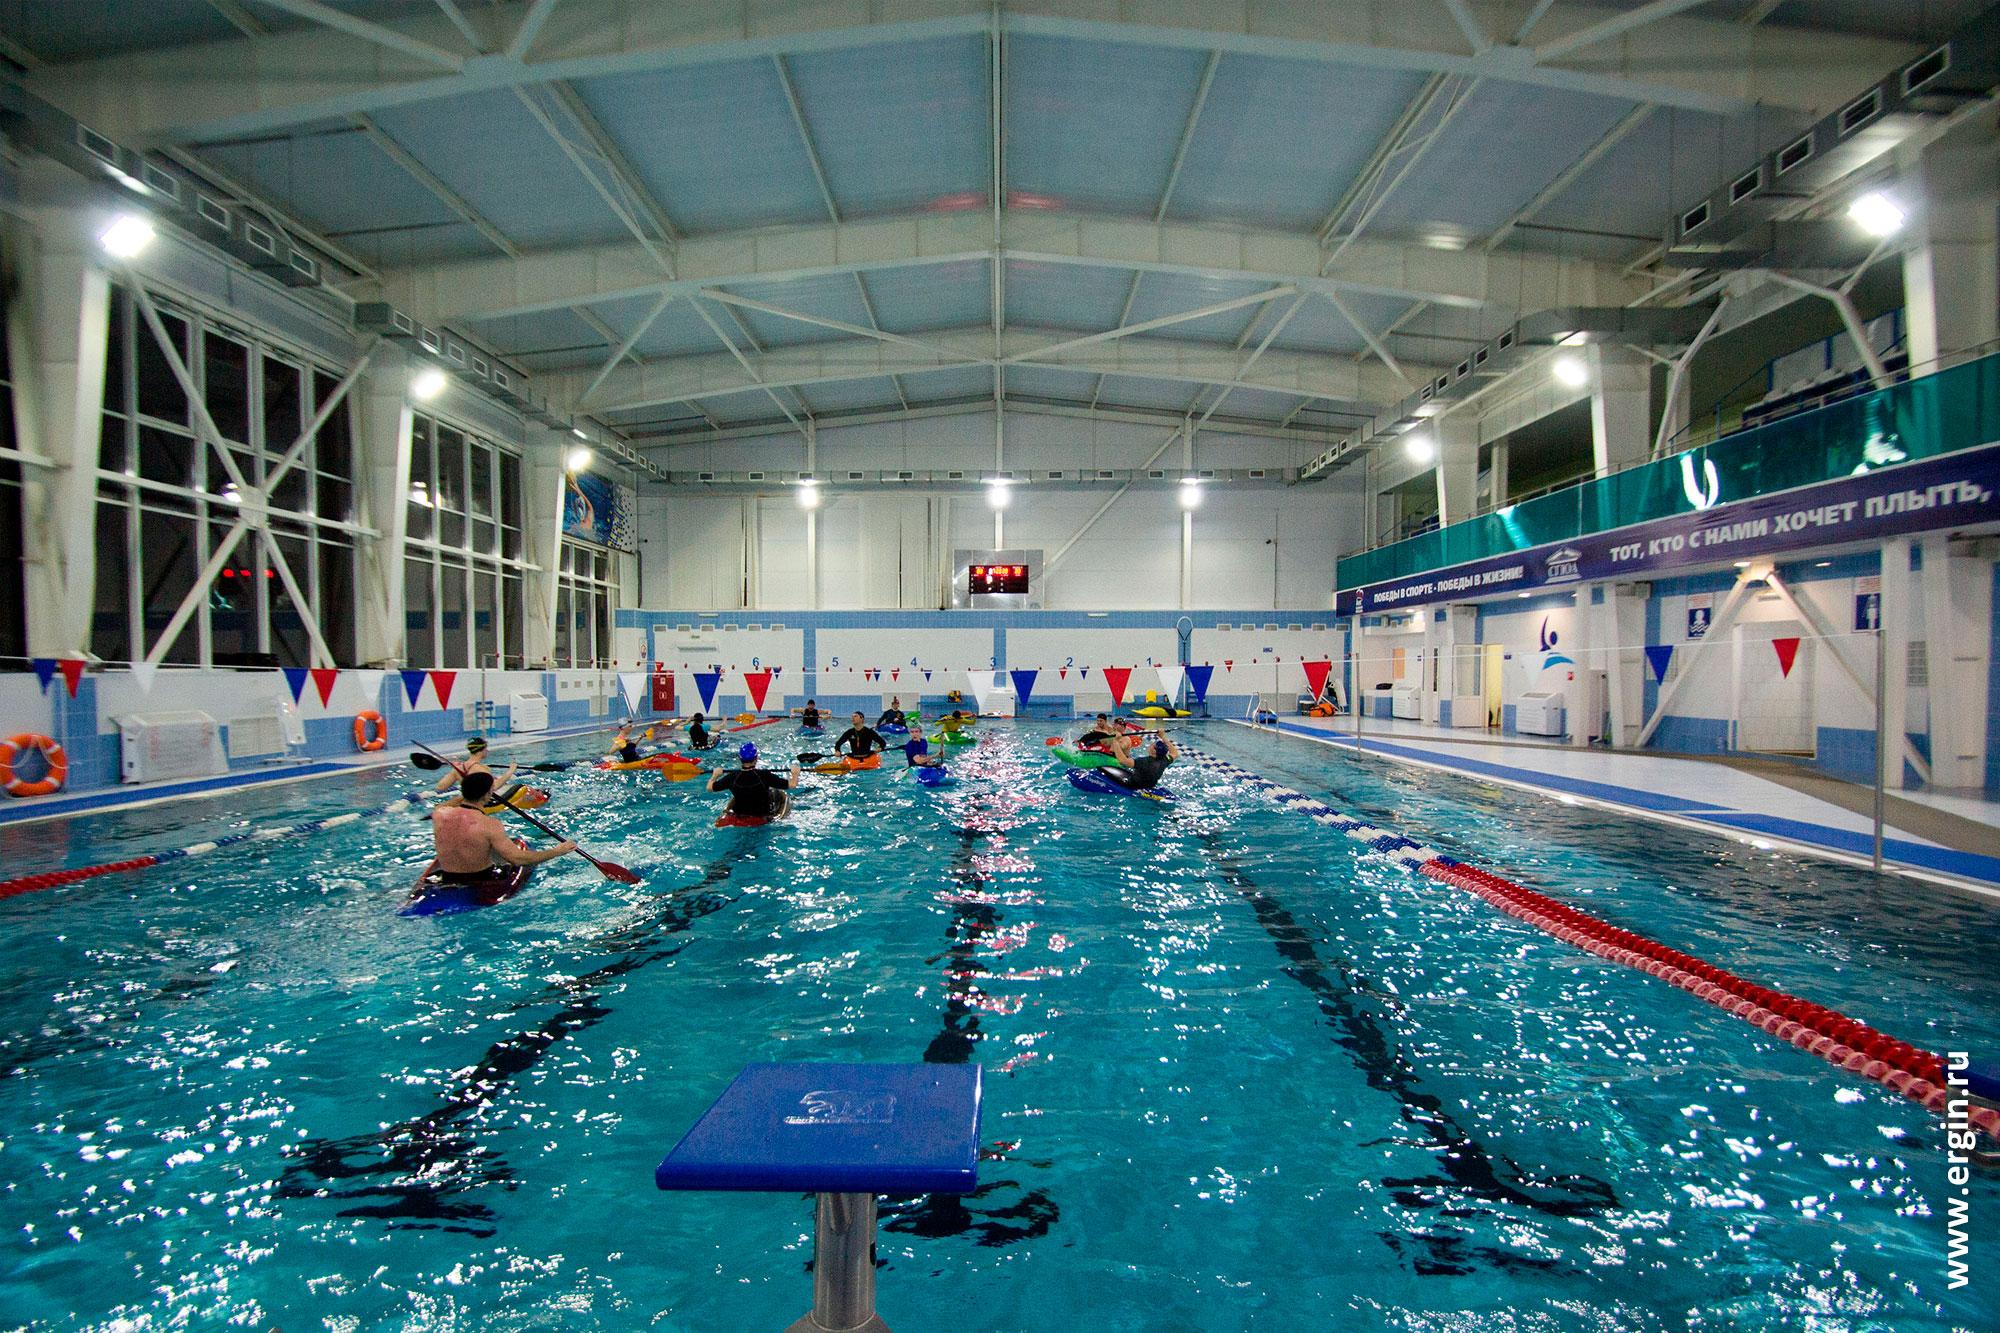 Тренировка на каяках в бассейне, школа каякинга